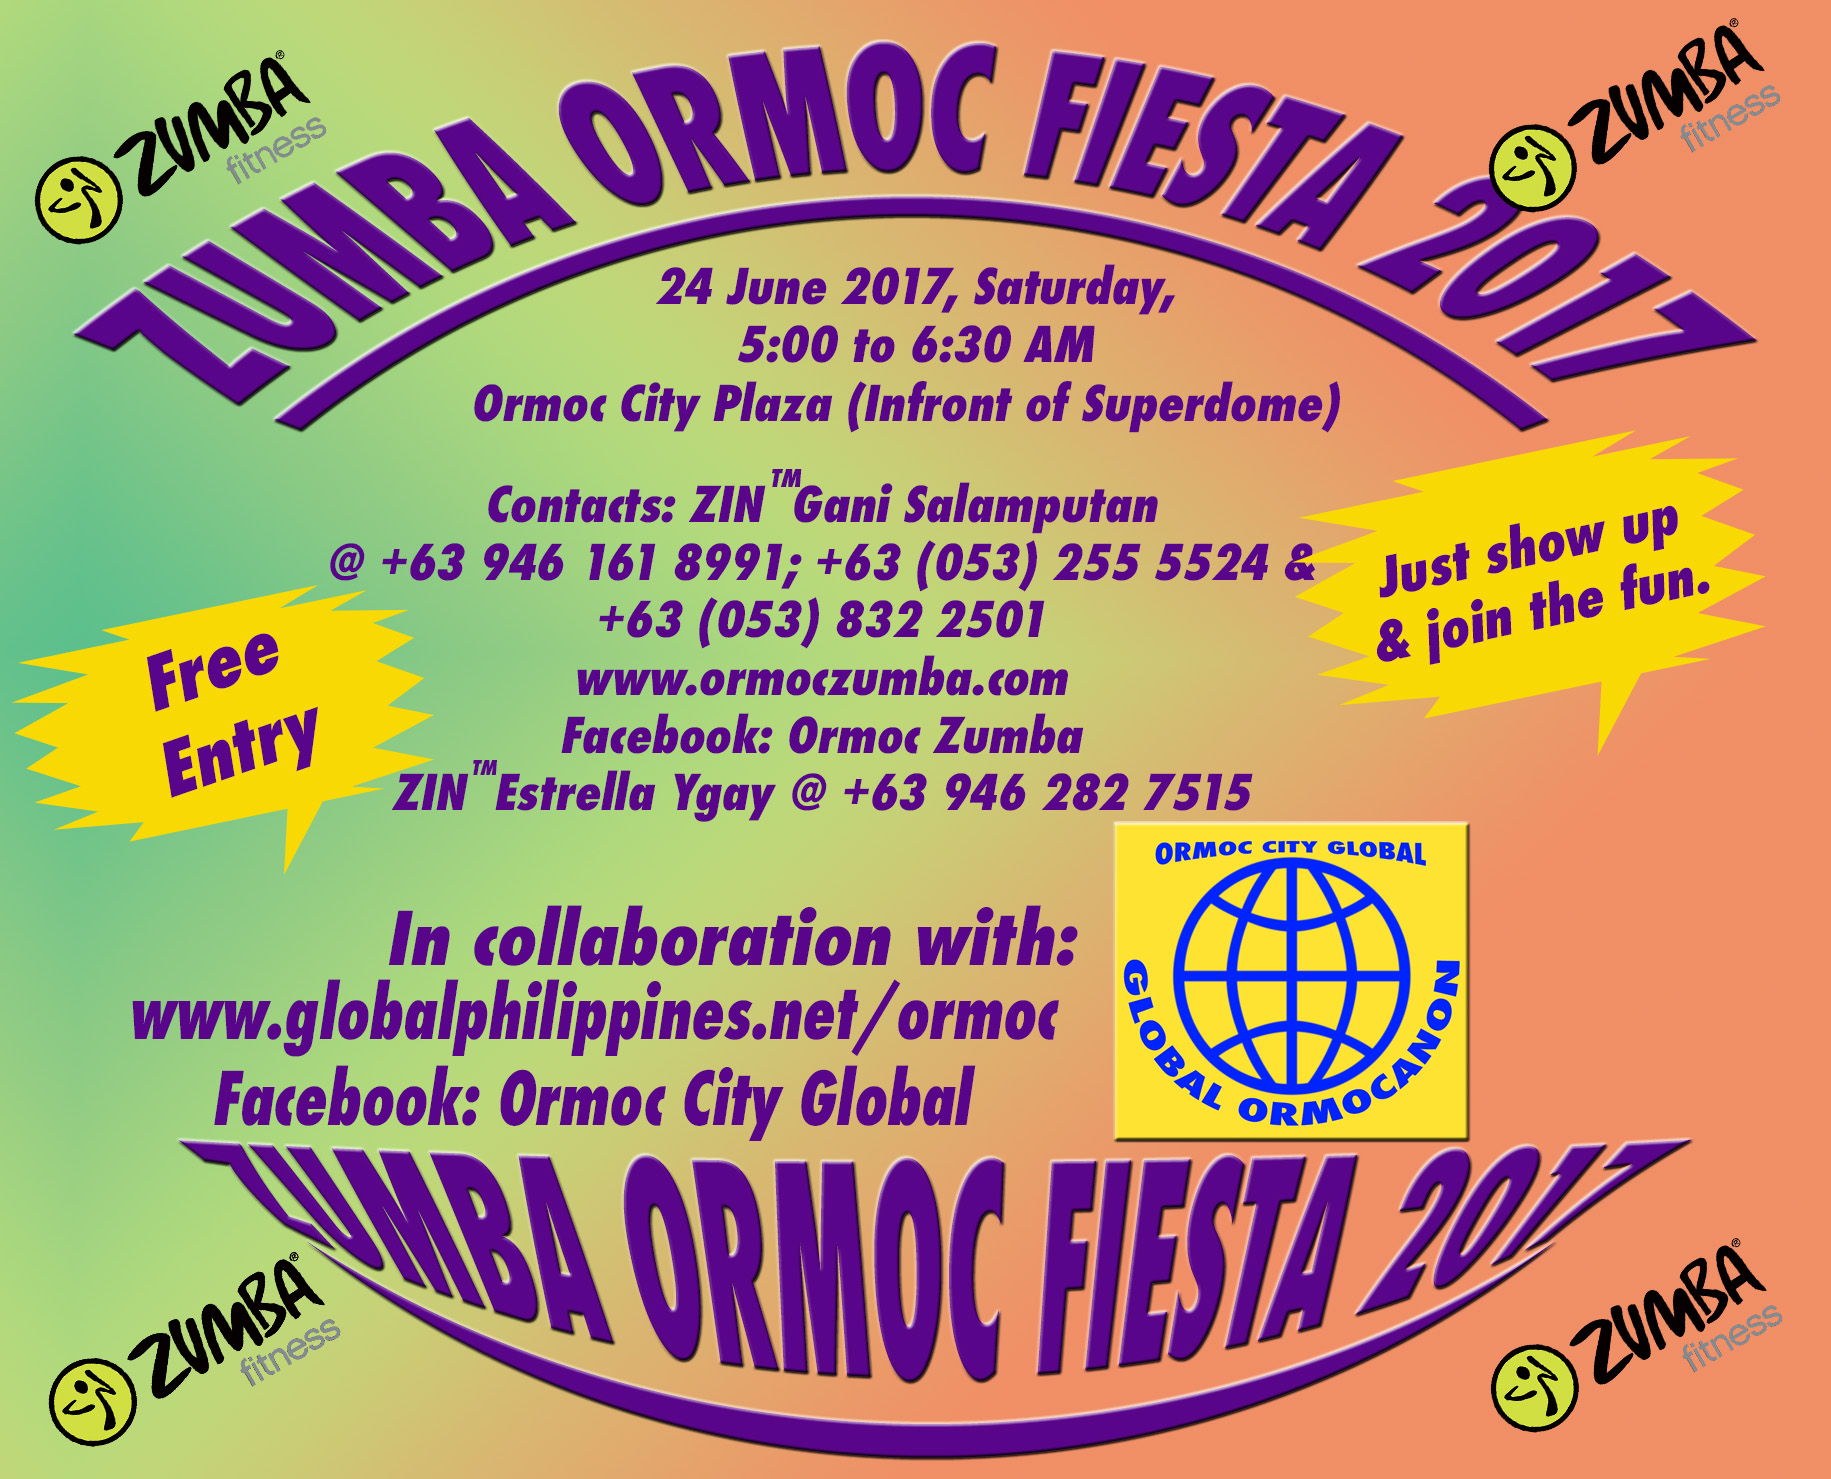 Zumba Ormoc City Fiesta 2017.